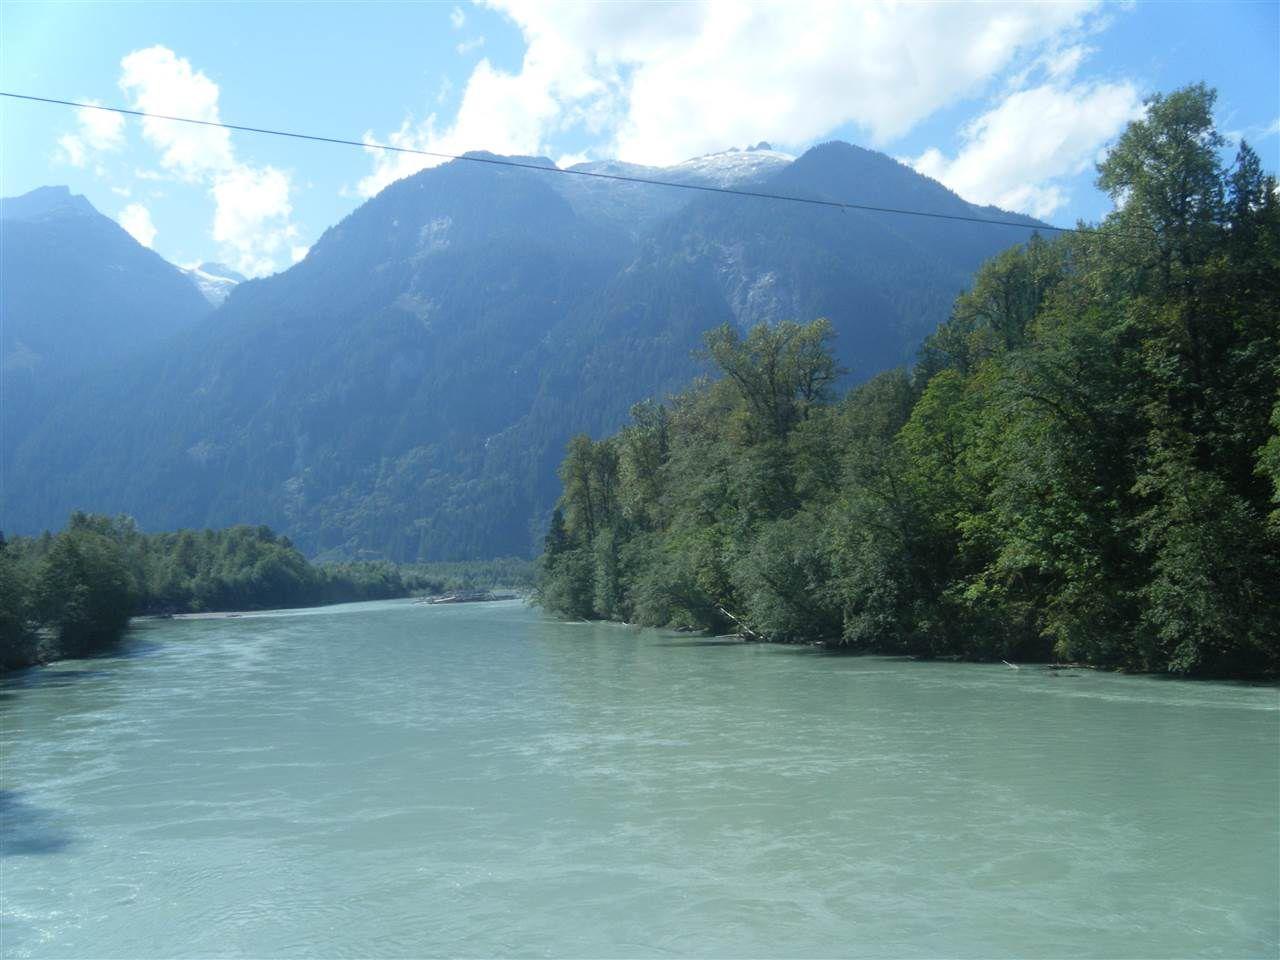 Main Photo: 14600 SQUAMISH VALLEY ROAD in Squamish: Upper Squamish Home for sale : MLS®# R2100484